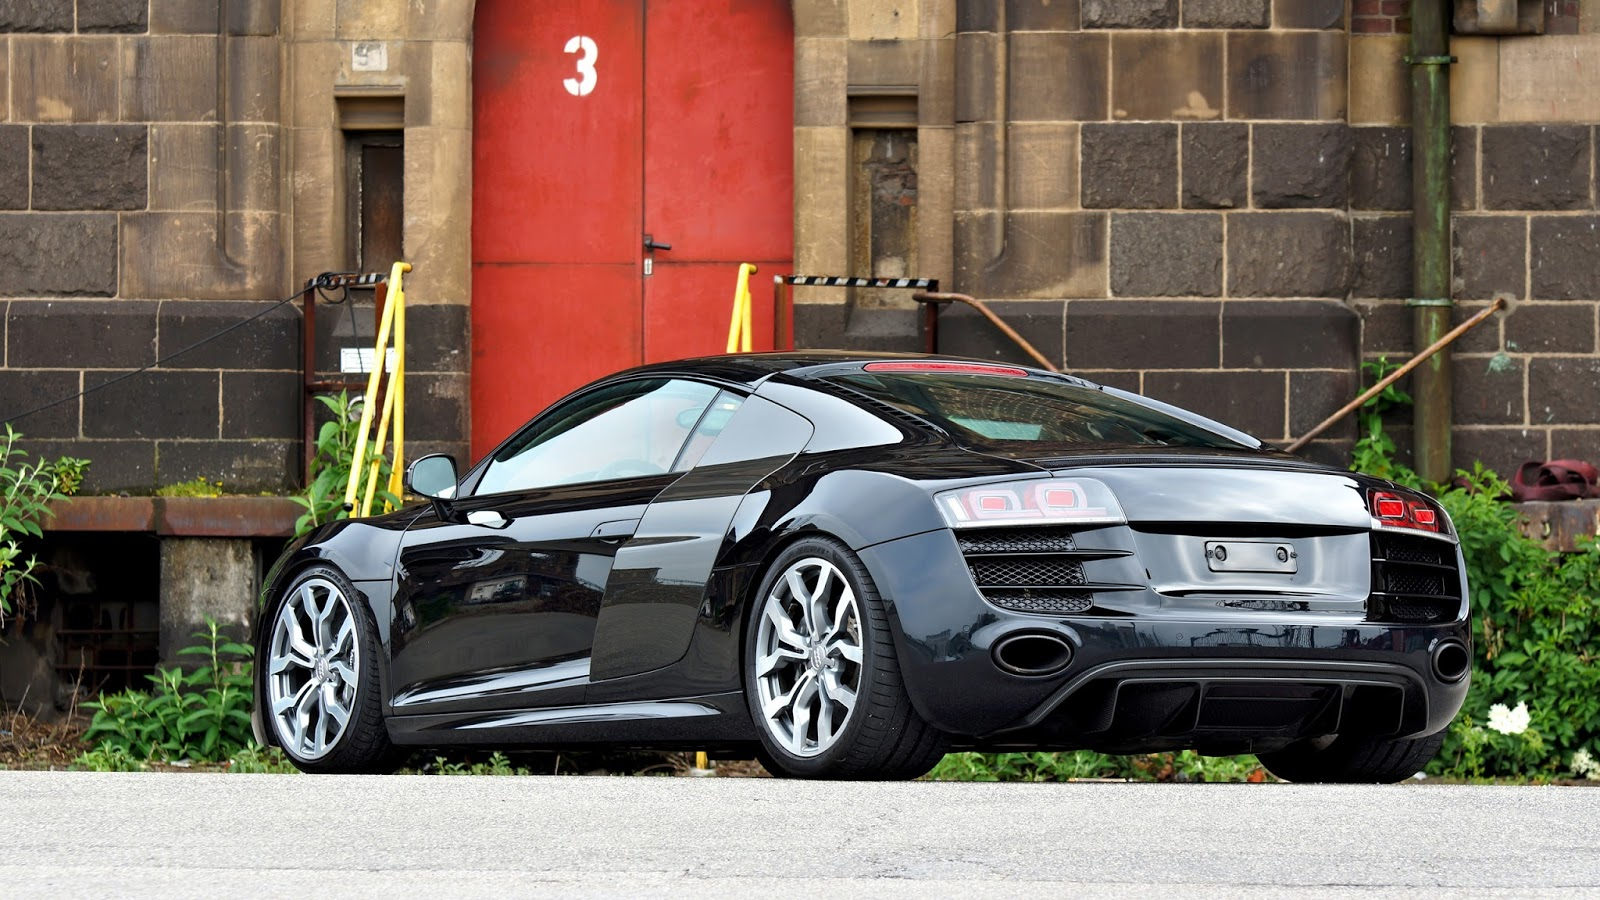 More detailed information about Audi R8 V10 R tronic directly at:  OK-Chiptuning Inh. Kai-Uwe OTTLINGHAUS Weserstraße 27 47506 Neukirchen-Vluyn